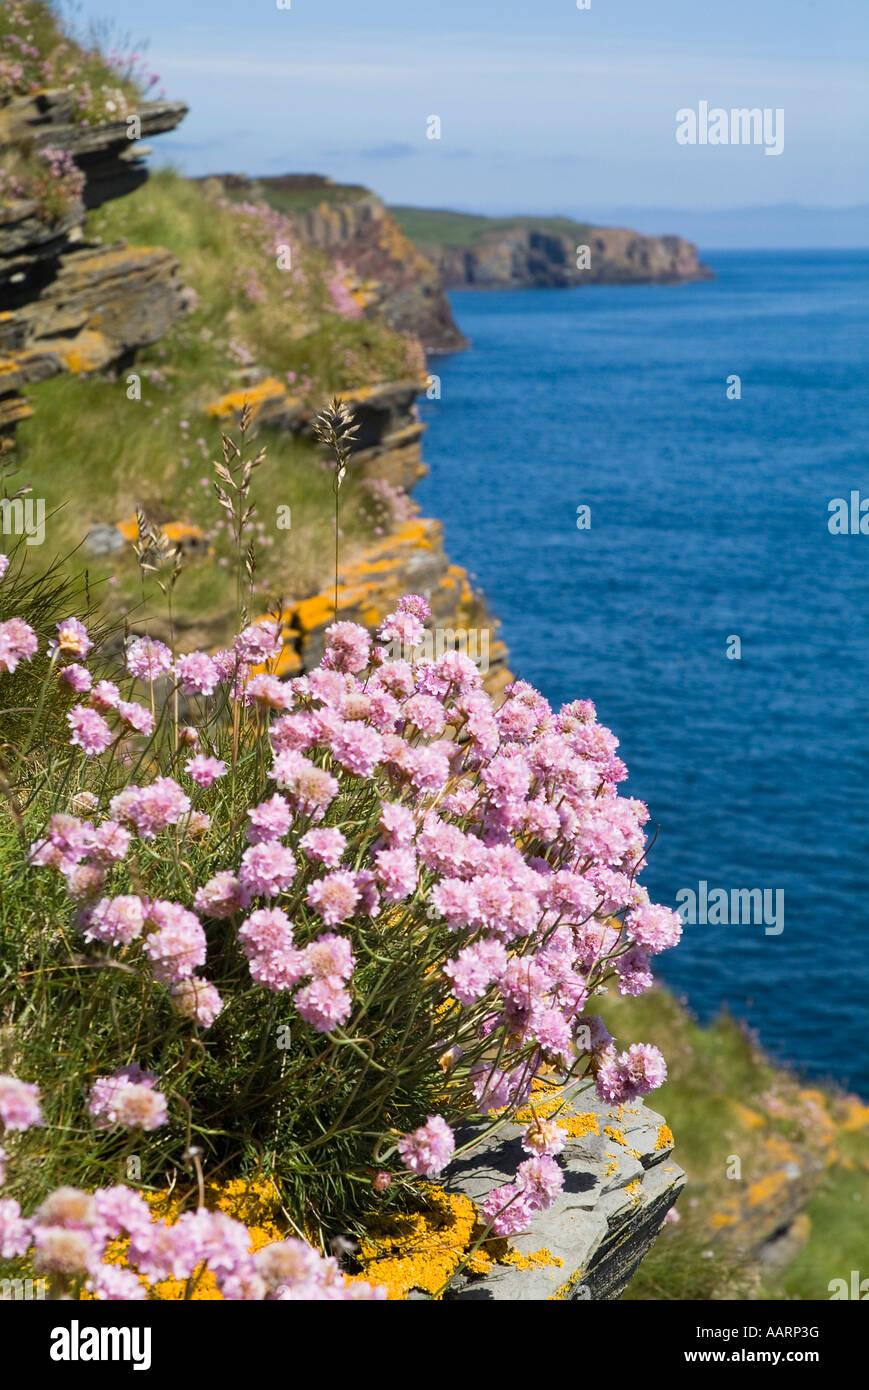 dh Armeria Maritima THRIFT CAITHNESS Sea pinks Thrift Armeria Maritima on Caithness seacliff North Sea coast - Stock Image